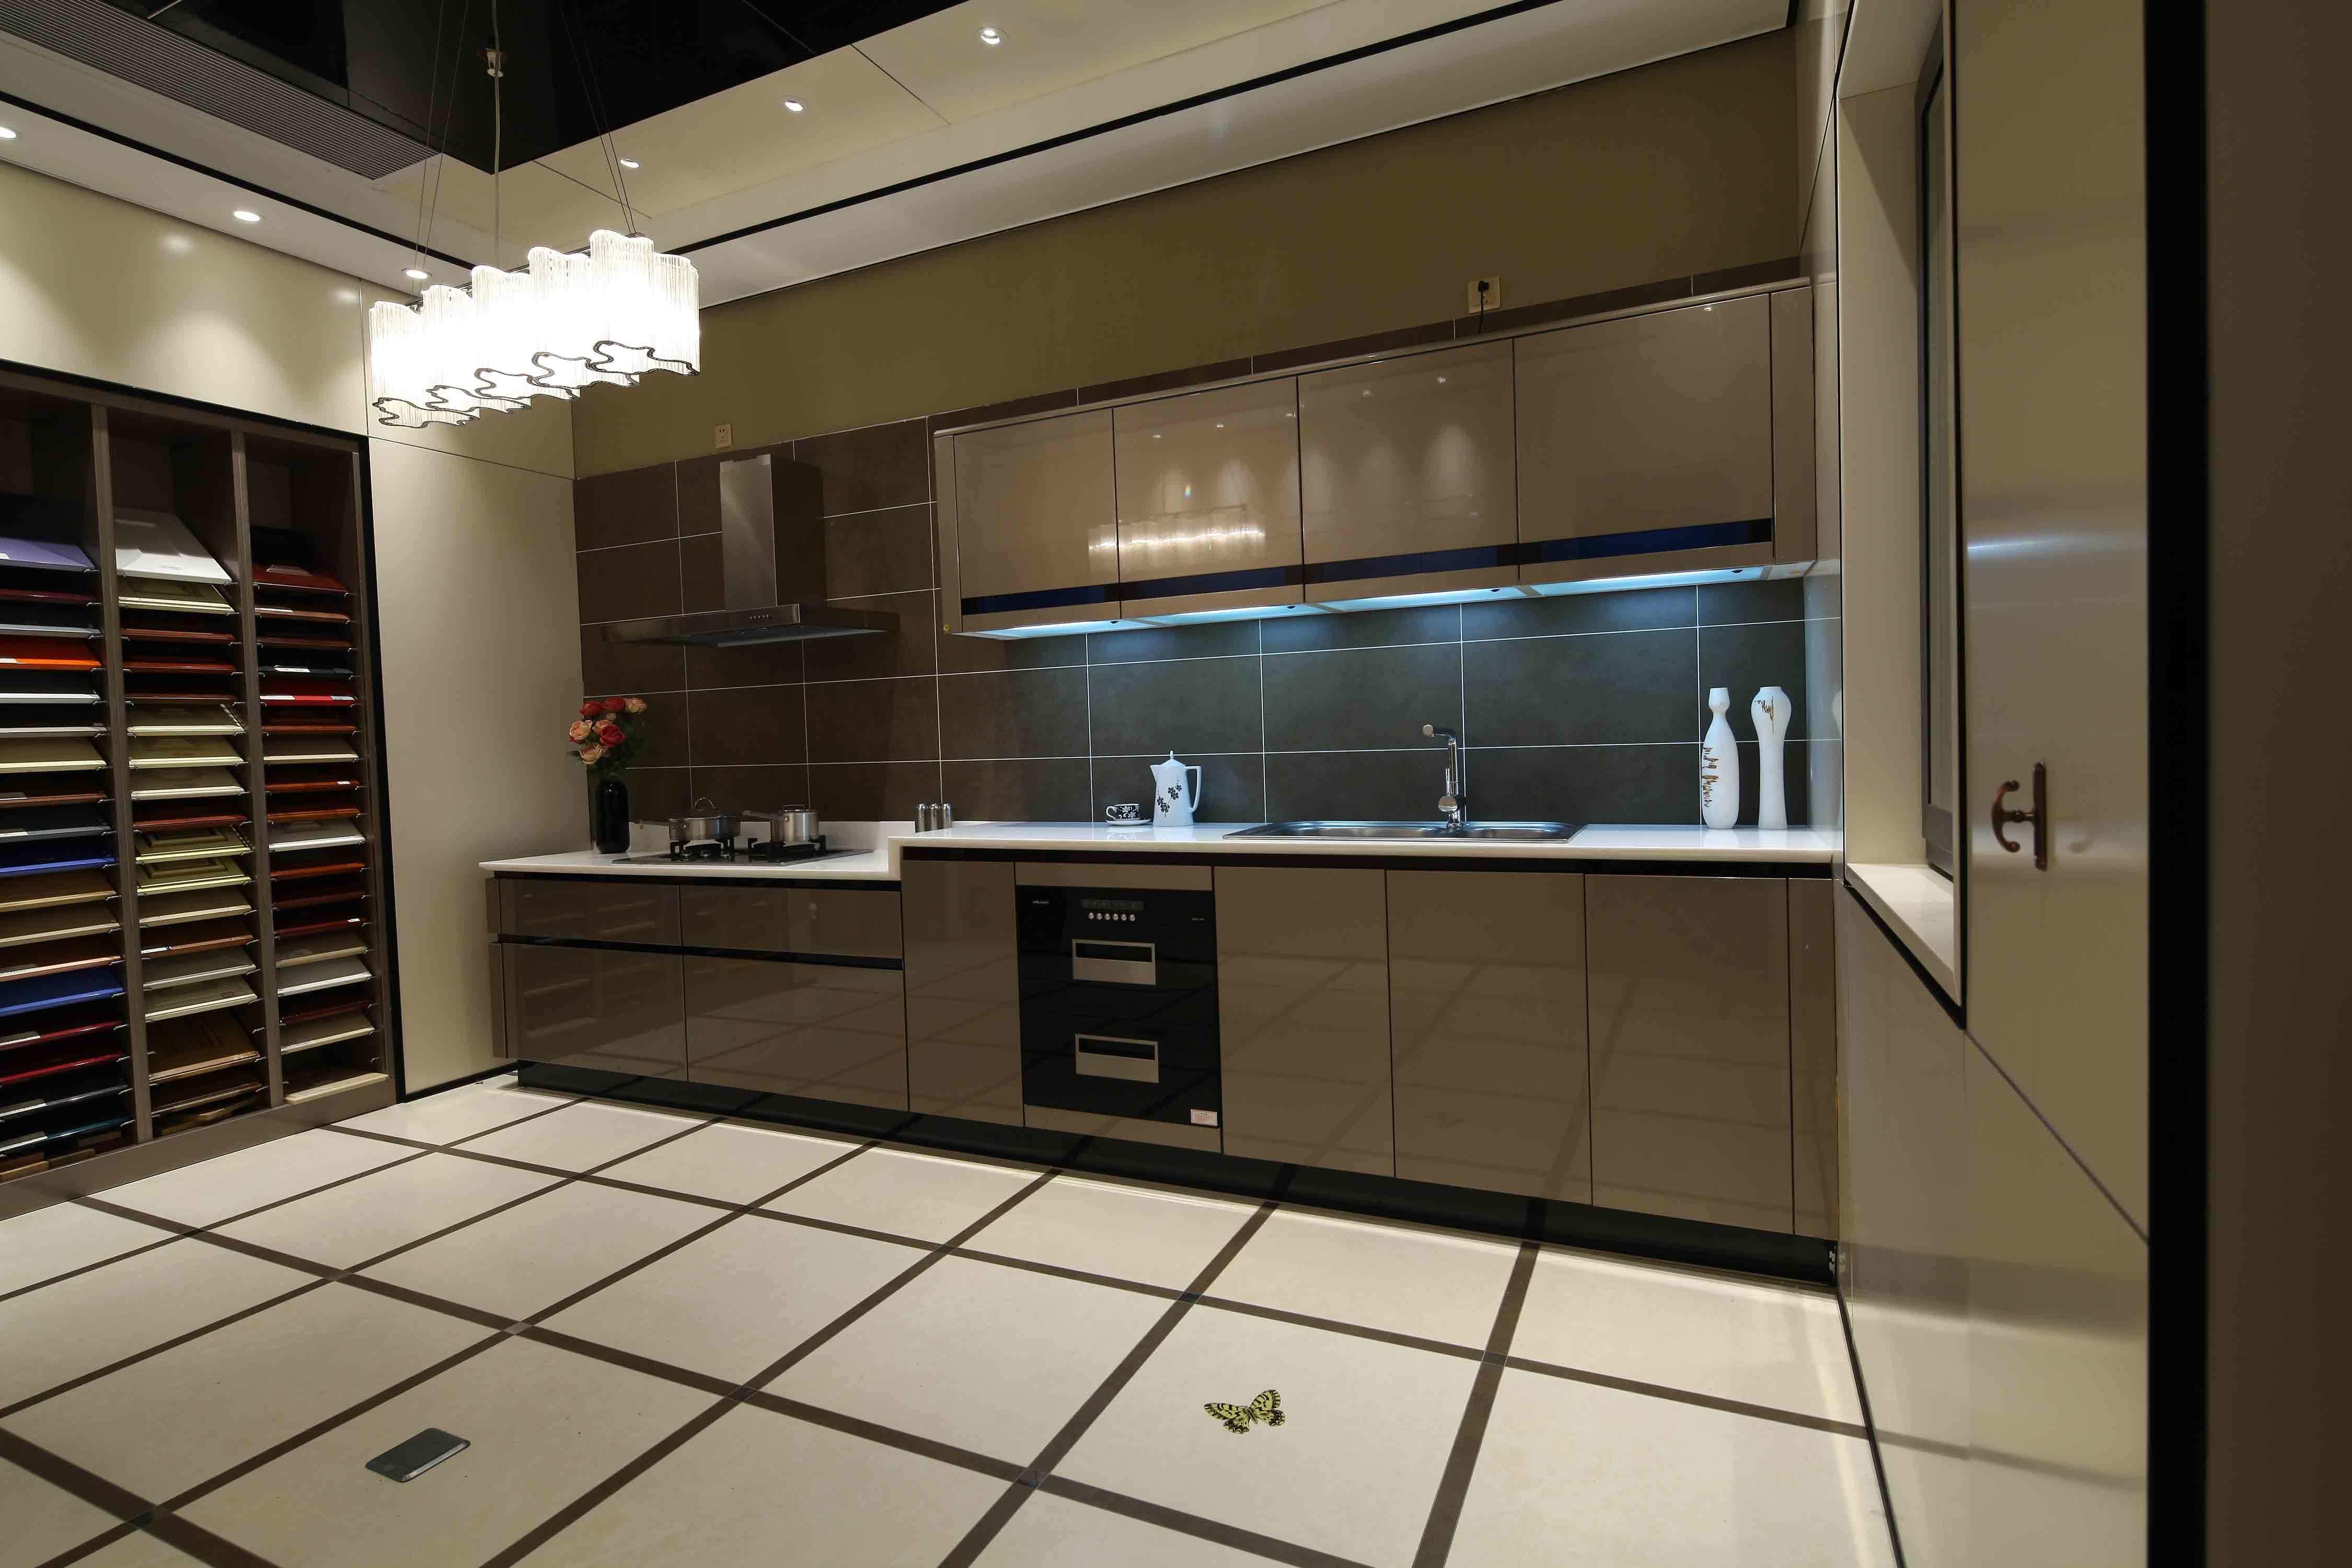 China Brown High Gloss Polyurethane Handless Kitchen ...